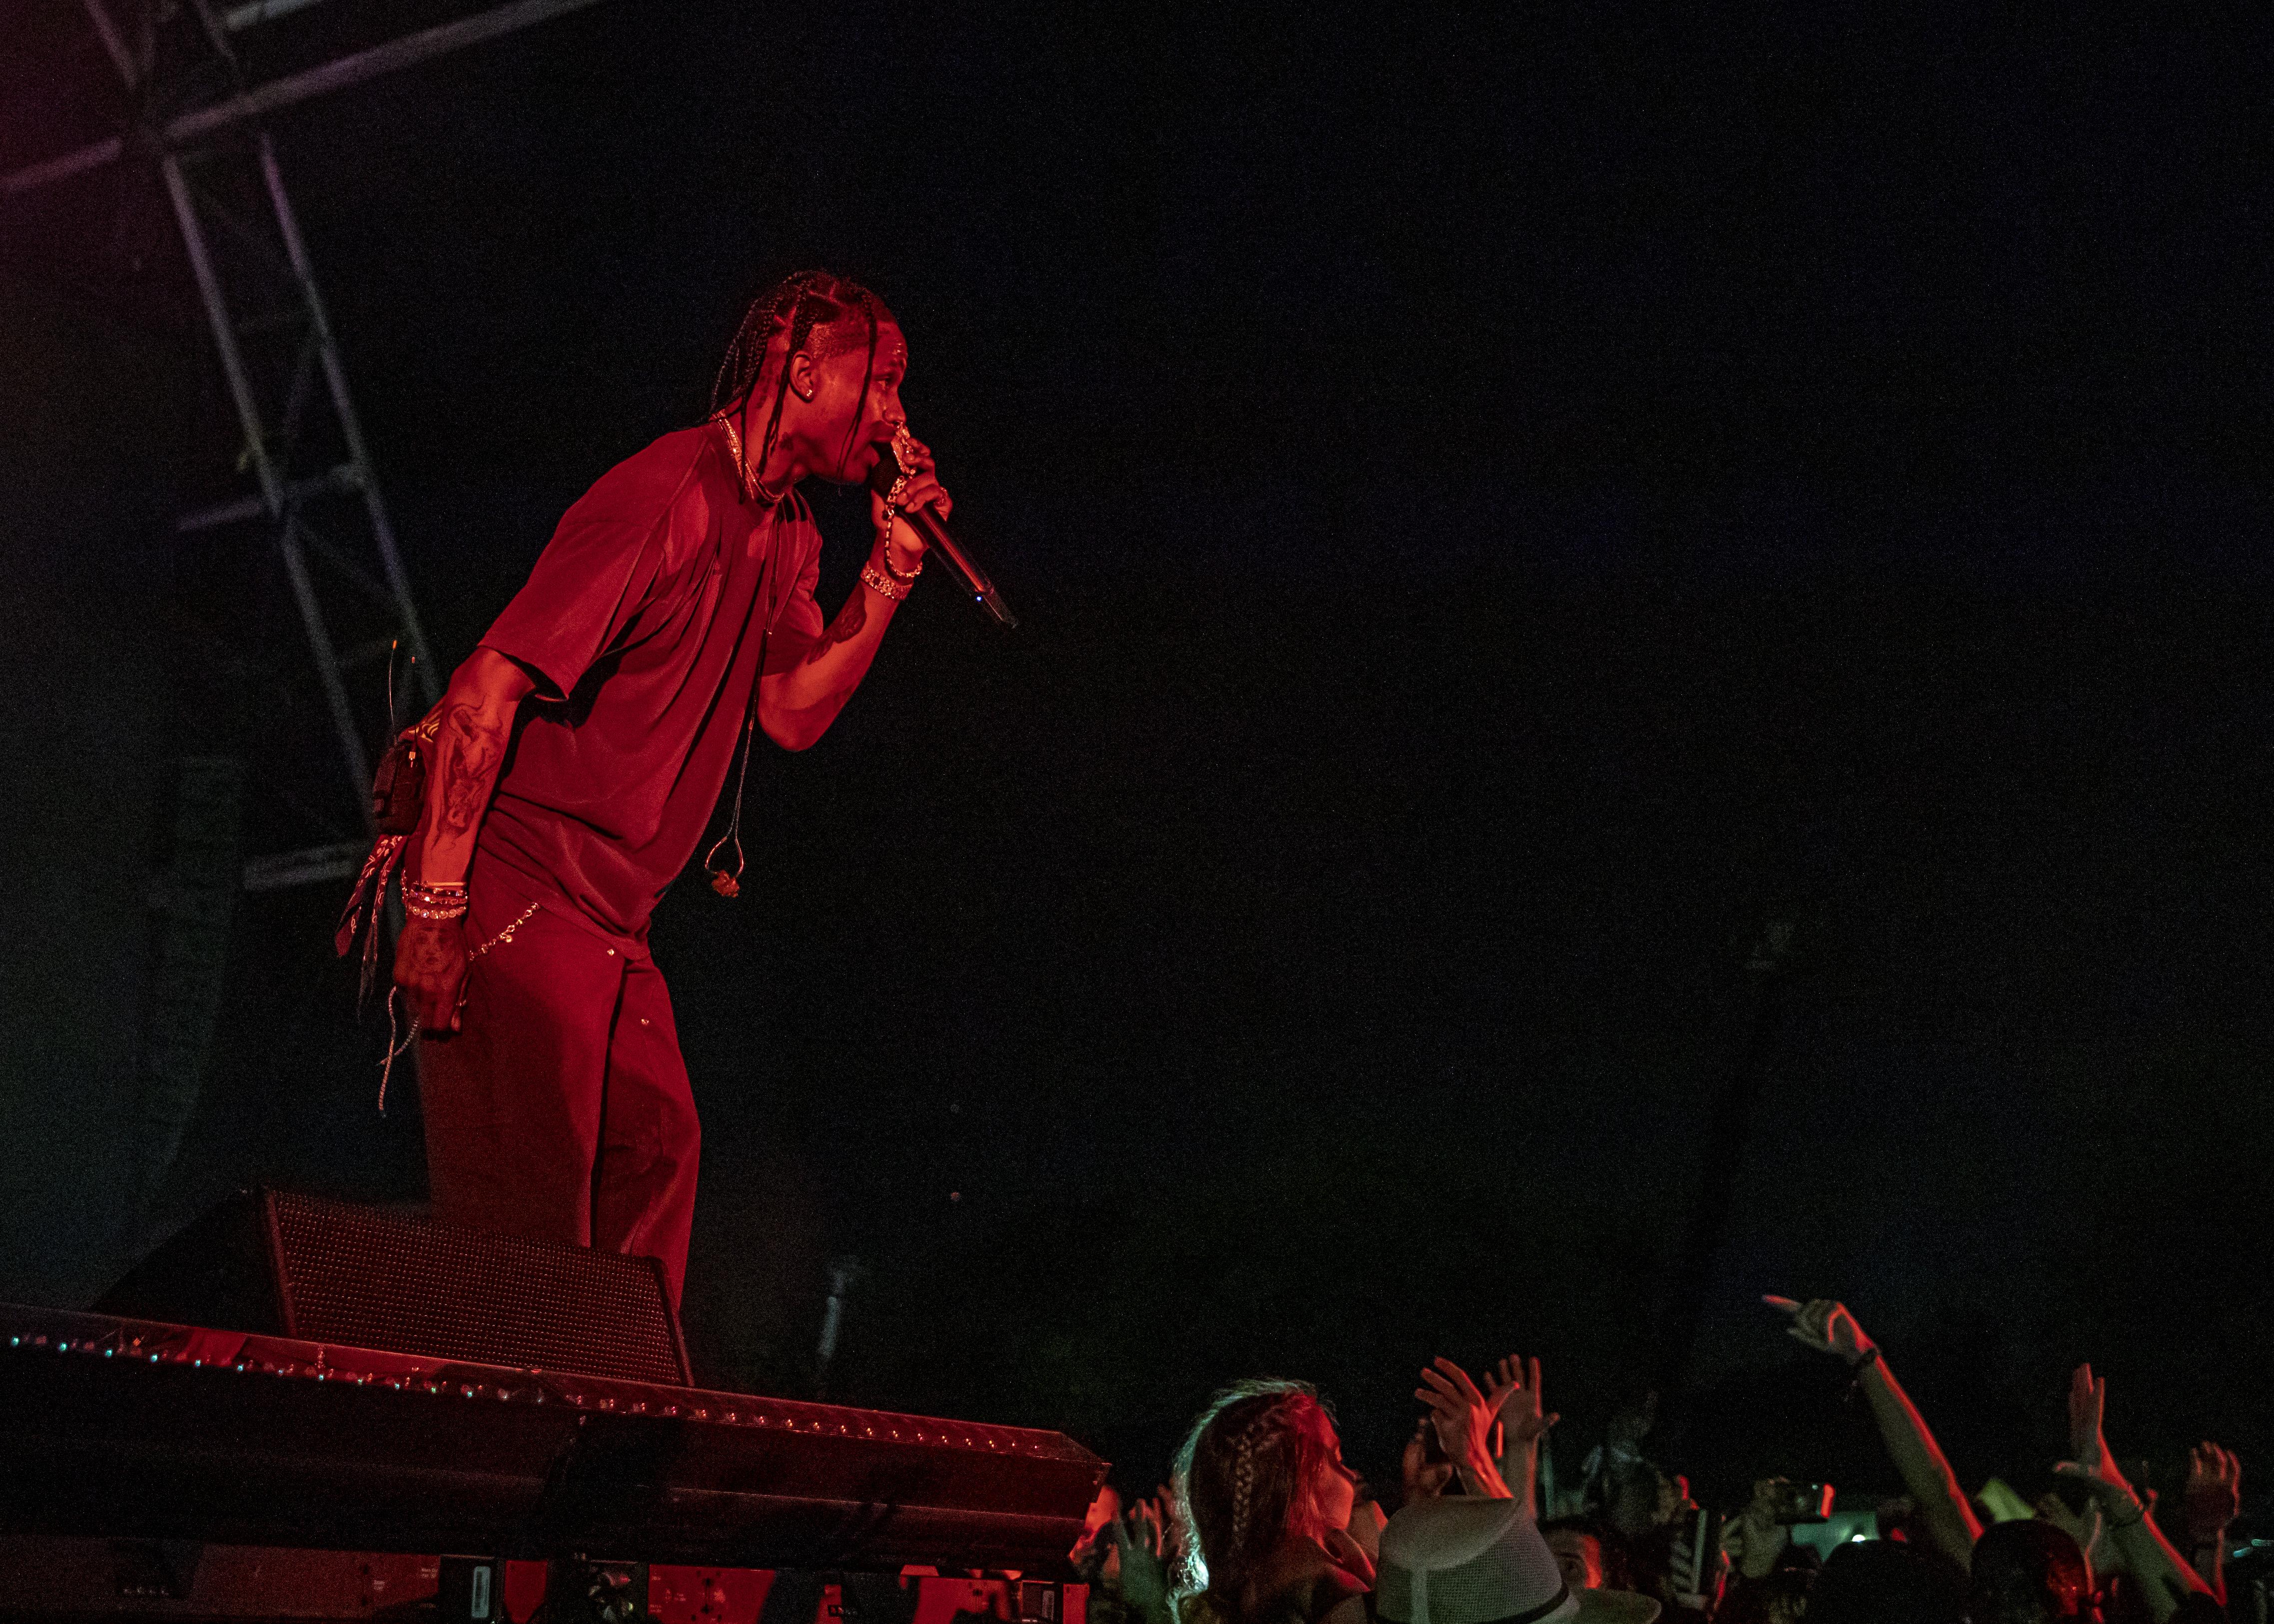 Fans Injured In Stampede At Travis Scott S Astroworld Festival